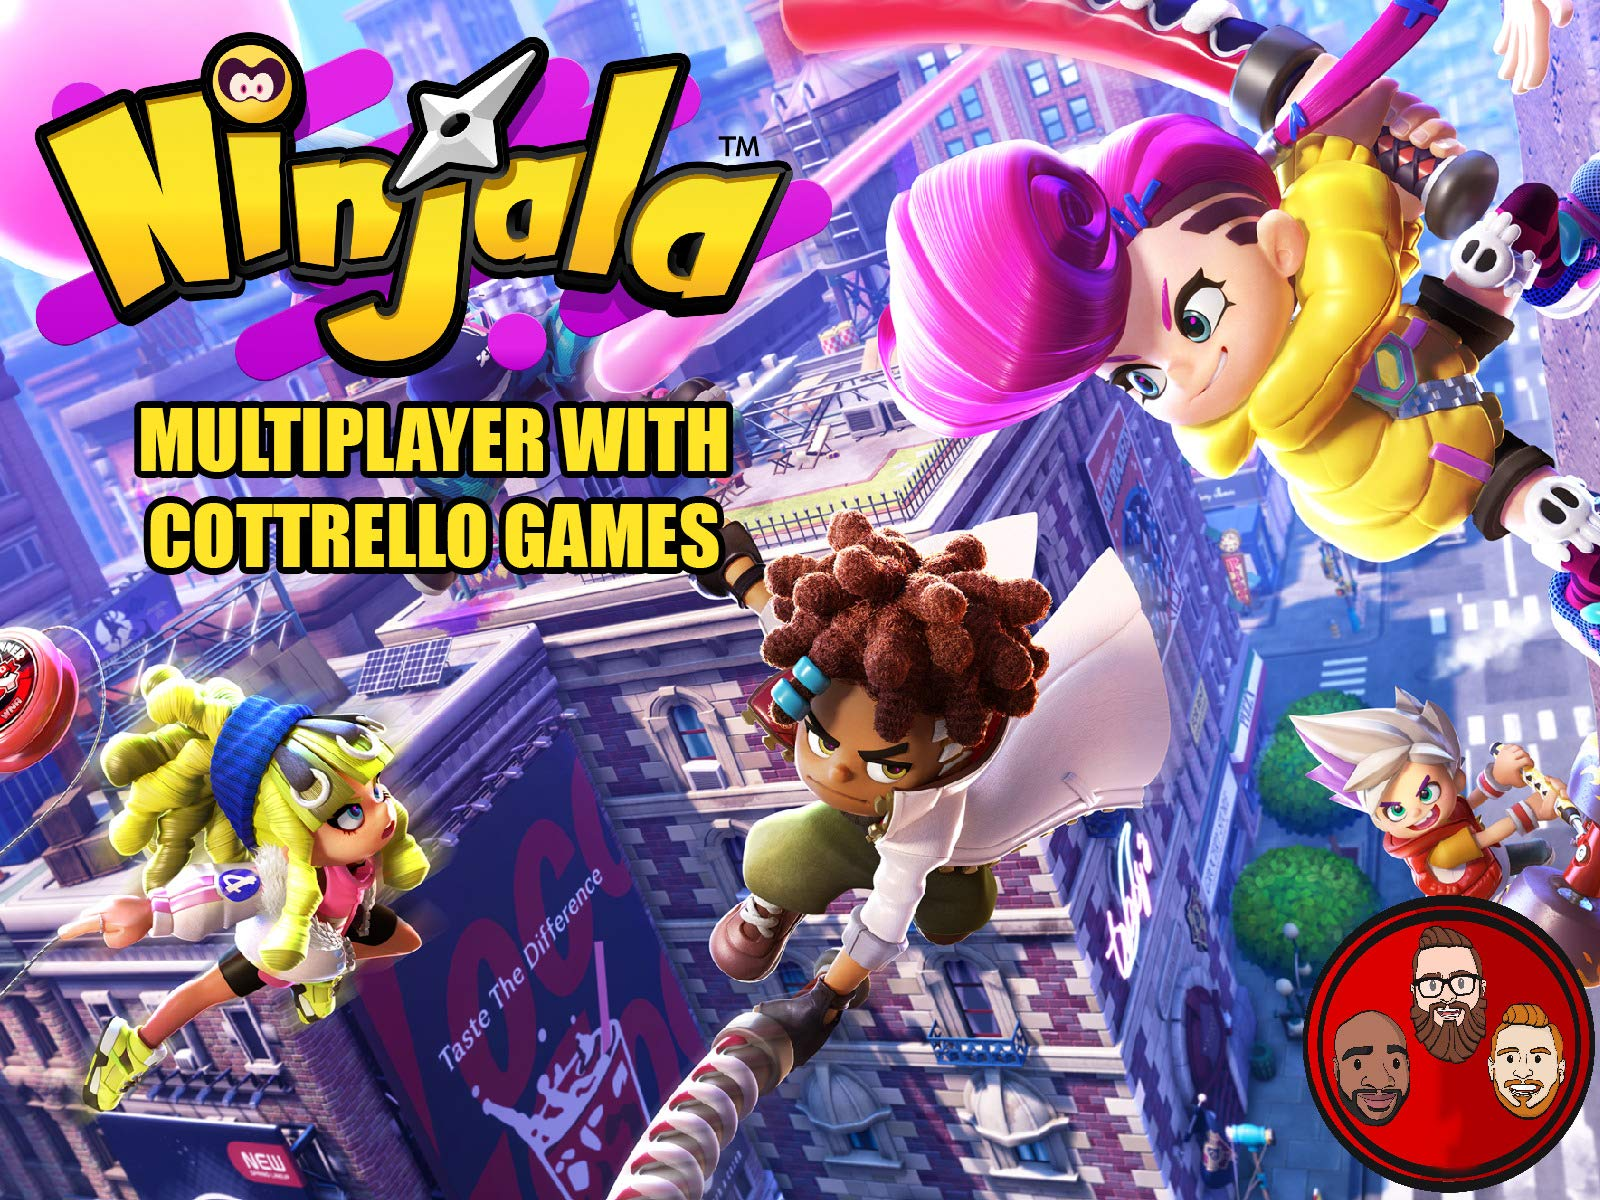 Ninjala Multiplayer with Cottrello Games - Season 1